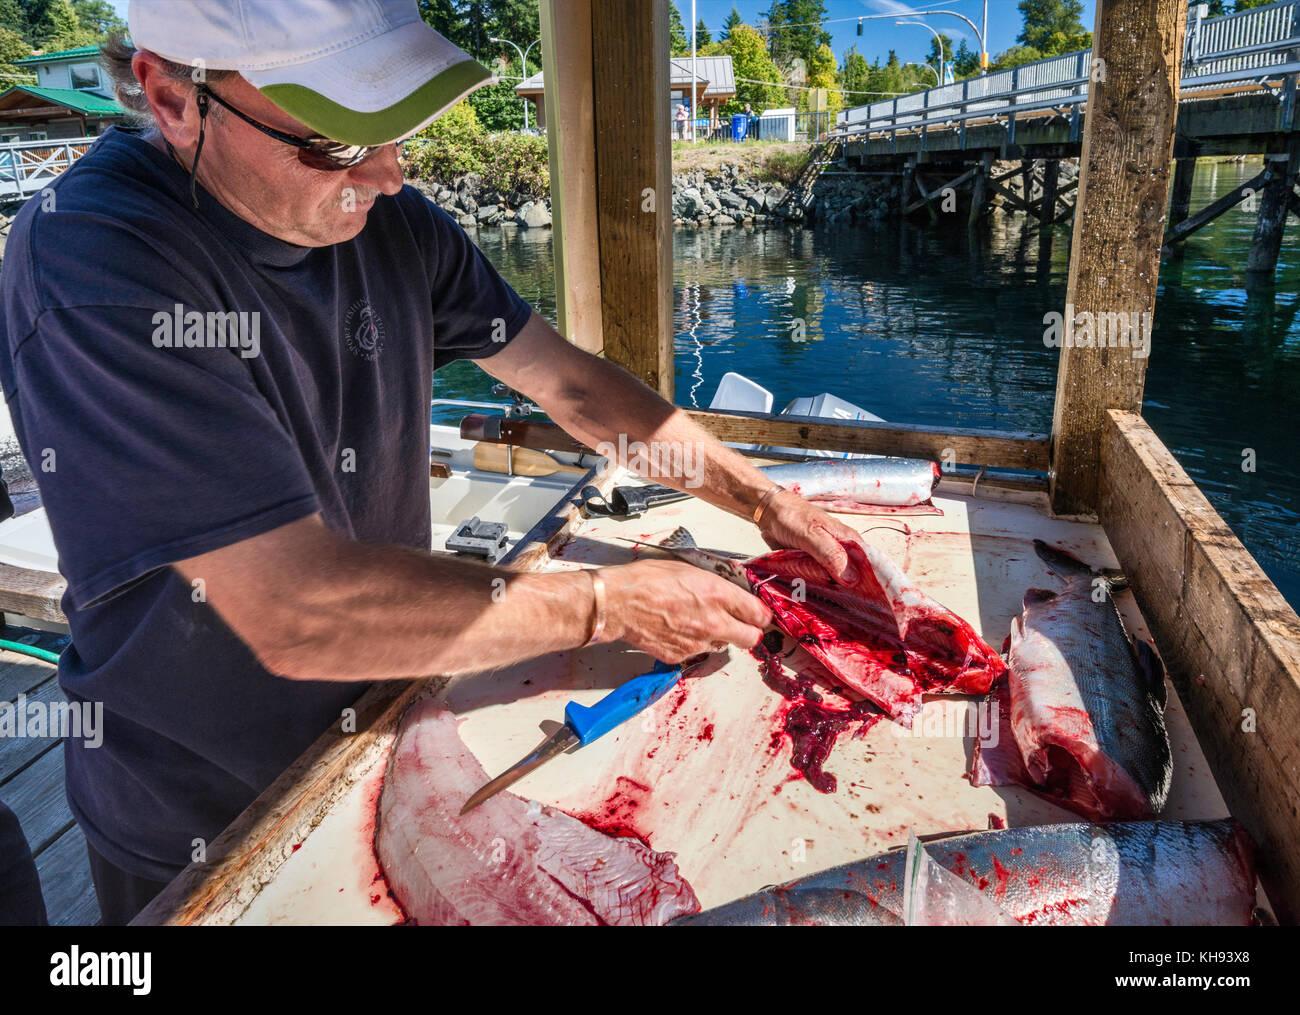 Mature man gutting fish at marina in Quathiaski Cove on Quadra Island, Vancouver Island area, British Columbia, - Stock Image